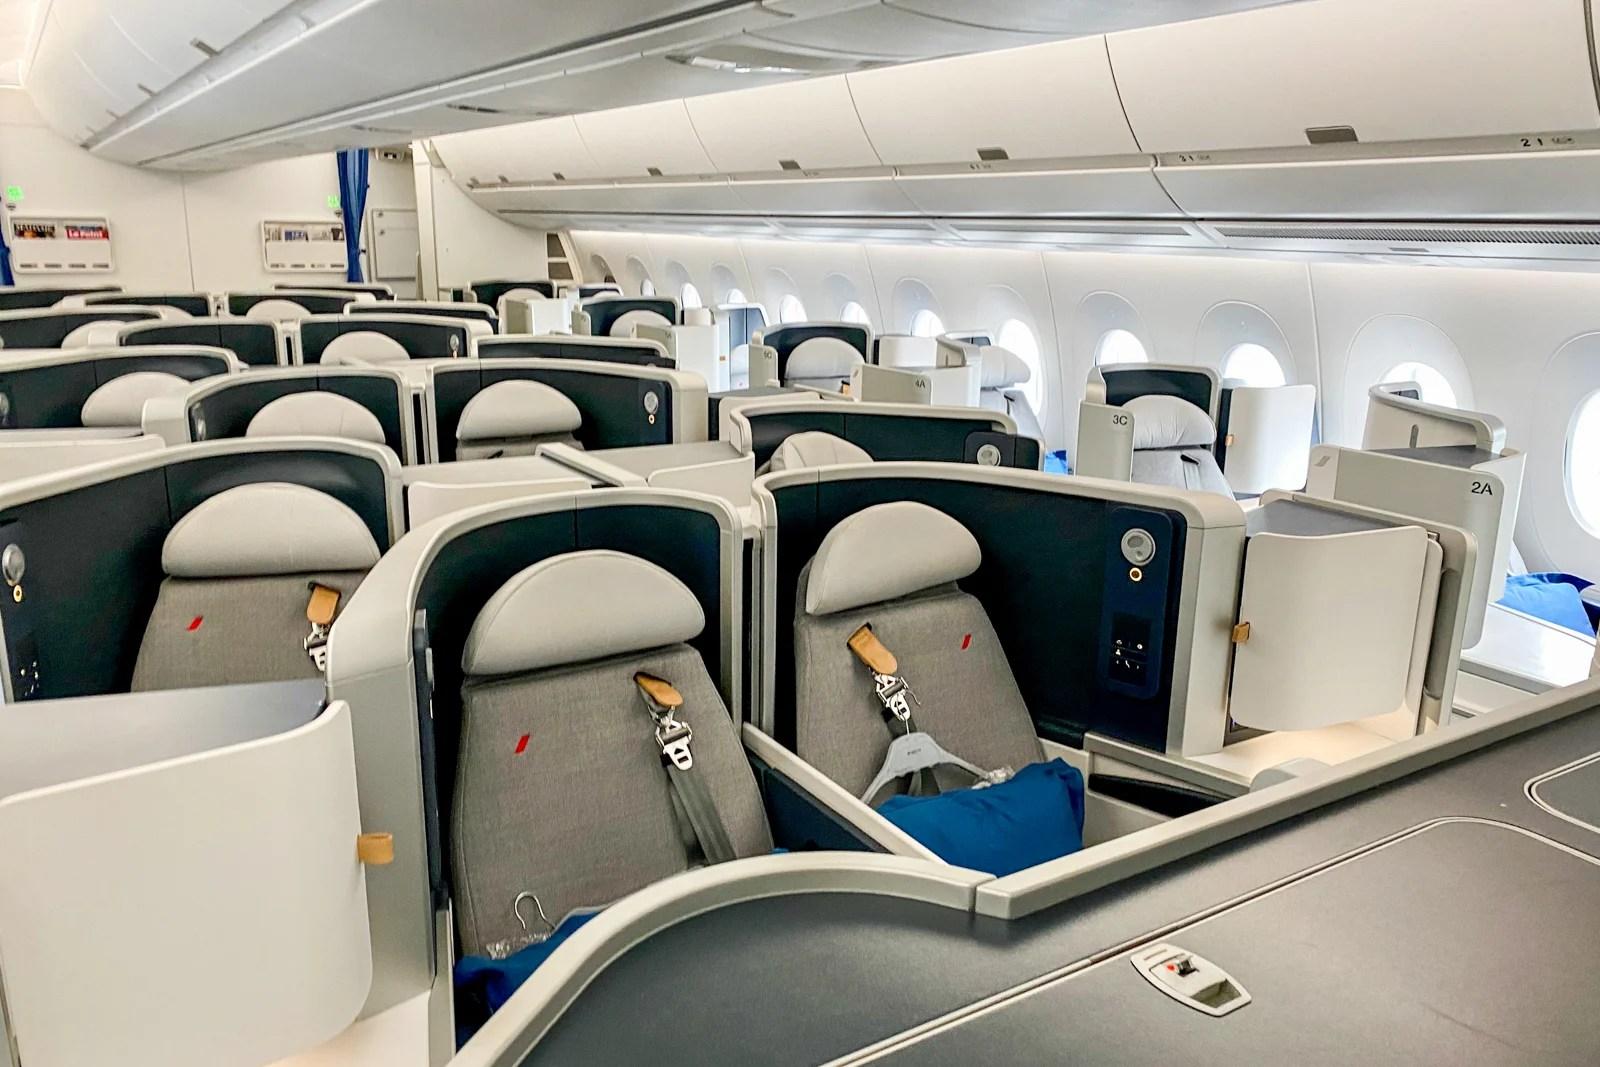 Flight review: Air France A350 biz class across the Atlantic